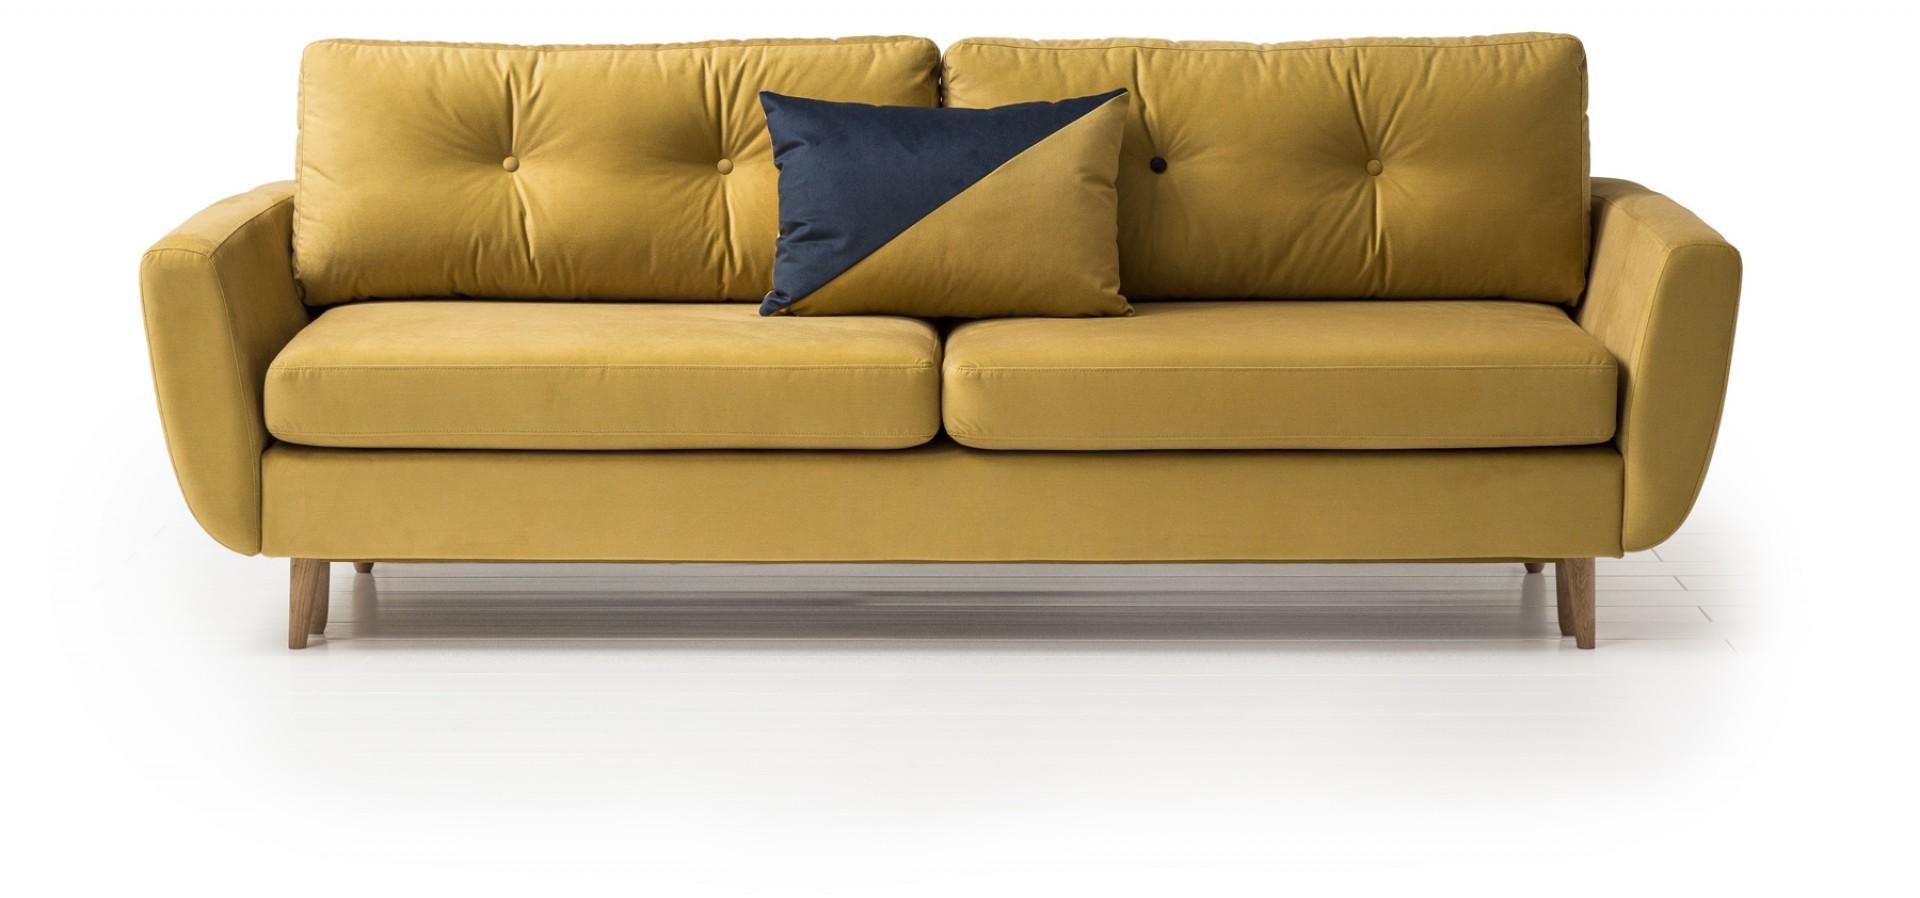 Katalog Mebli Harris Super Wygodna Sofa Meblecompl